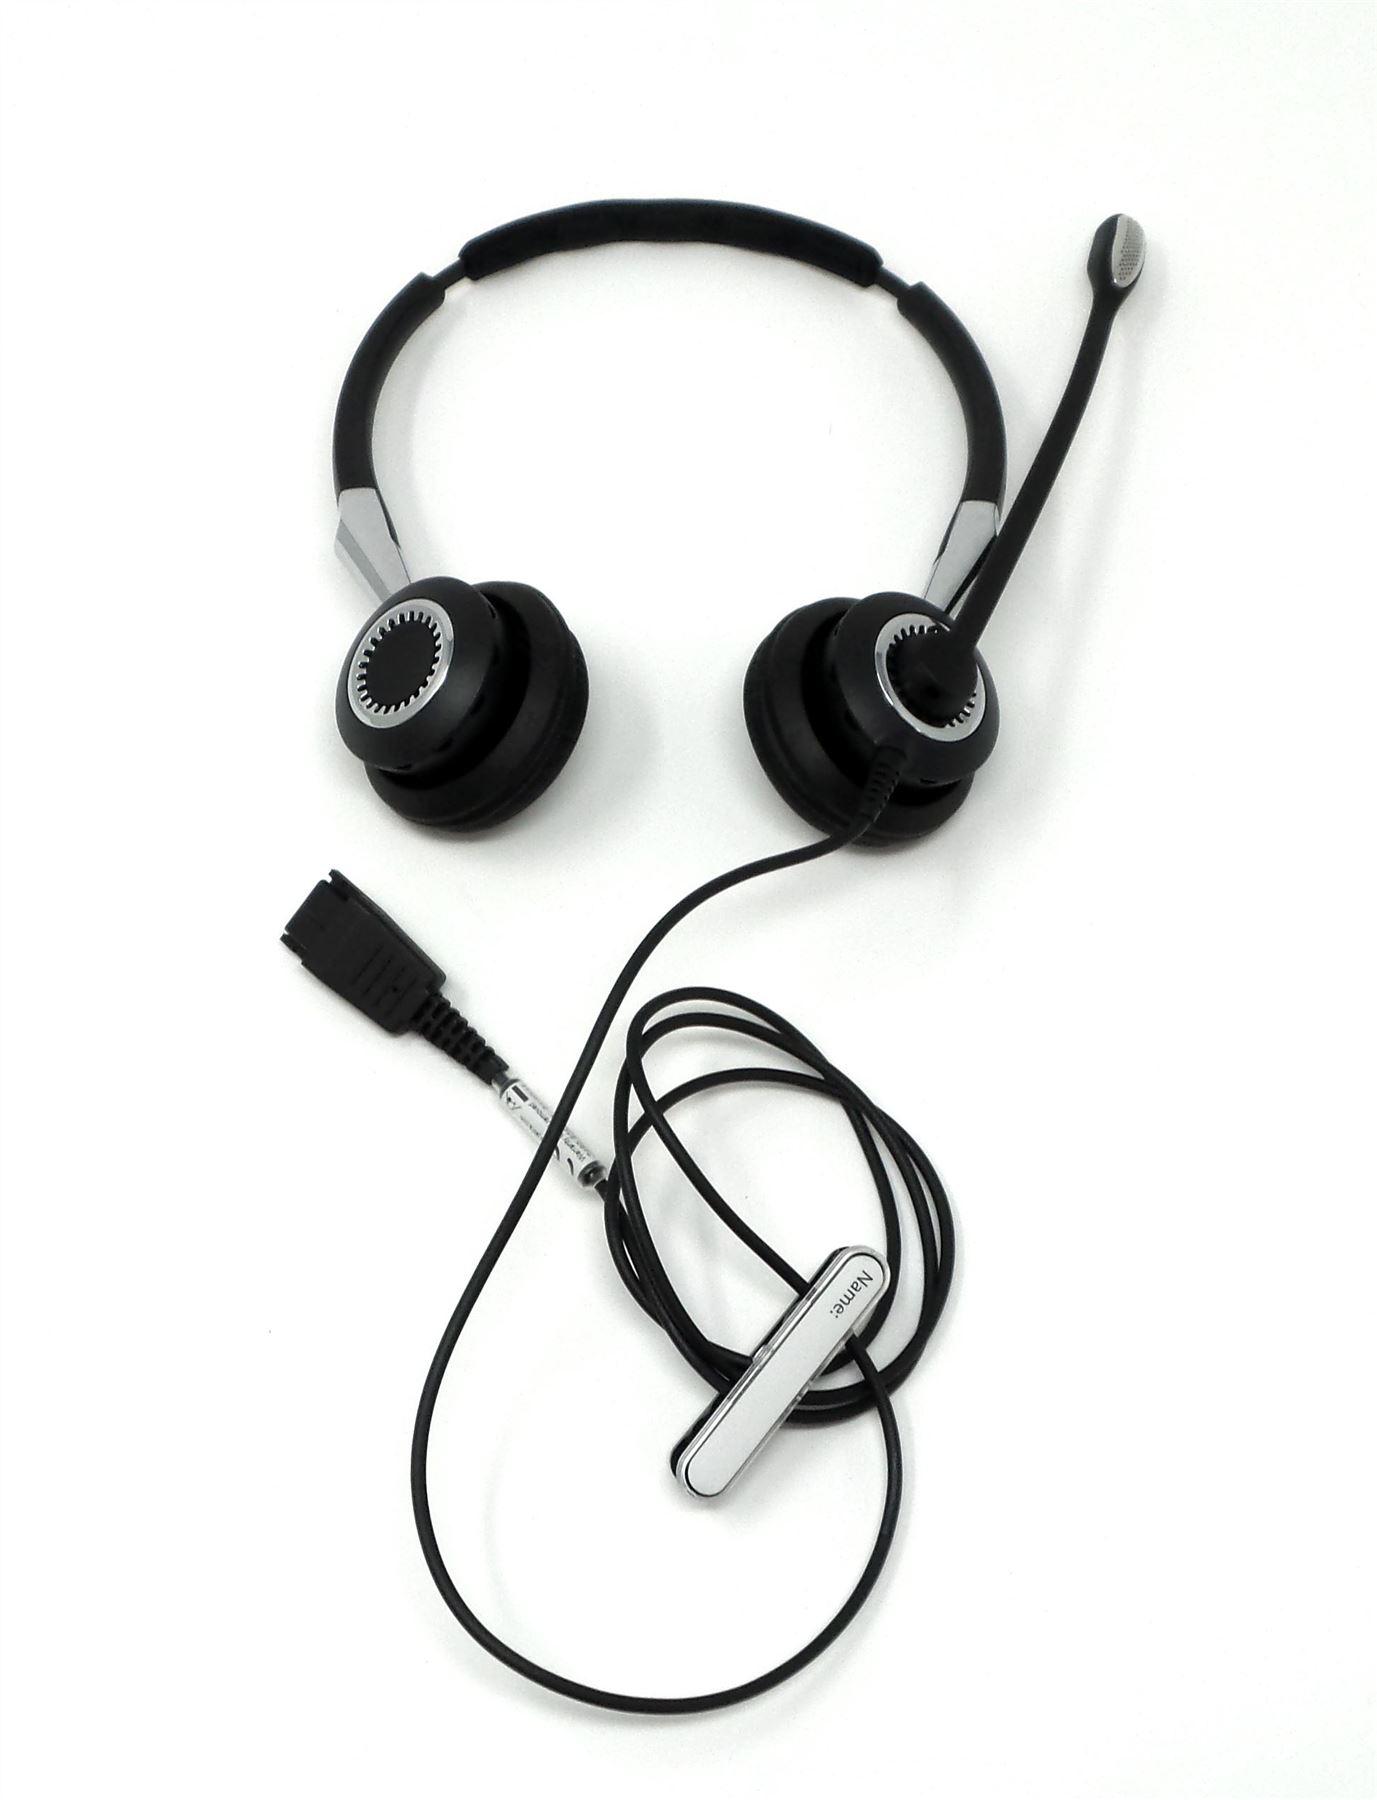 Jabra Biz 2400 Ii Qd Duo Nc Wideband On Ear Wired Headset Black 2489 Rox Bluetooth Earphone Putih Limited 825 209